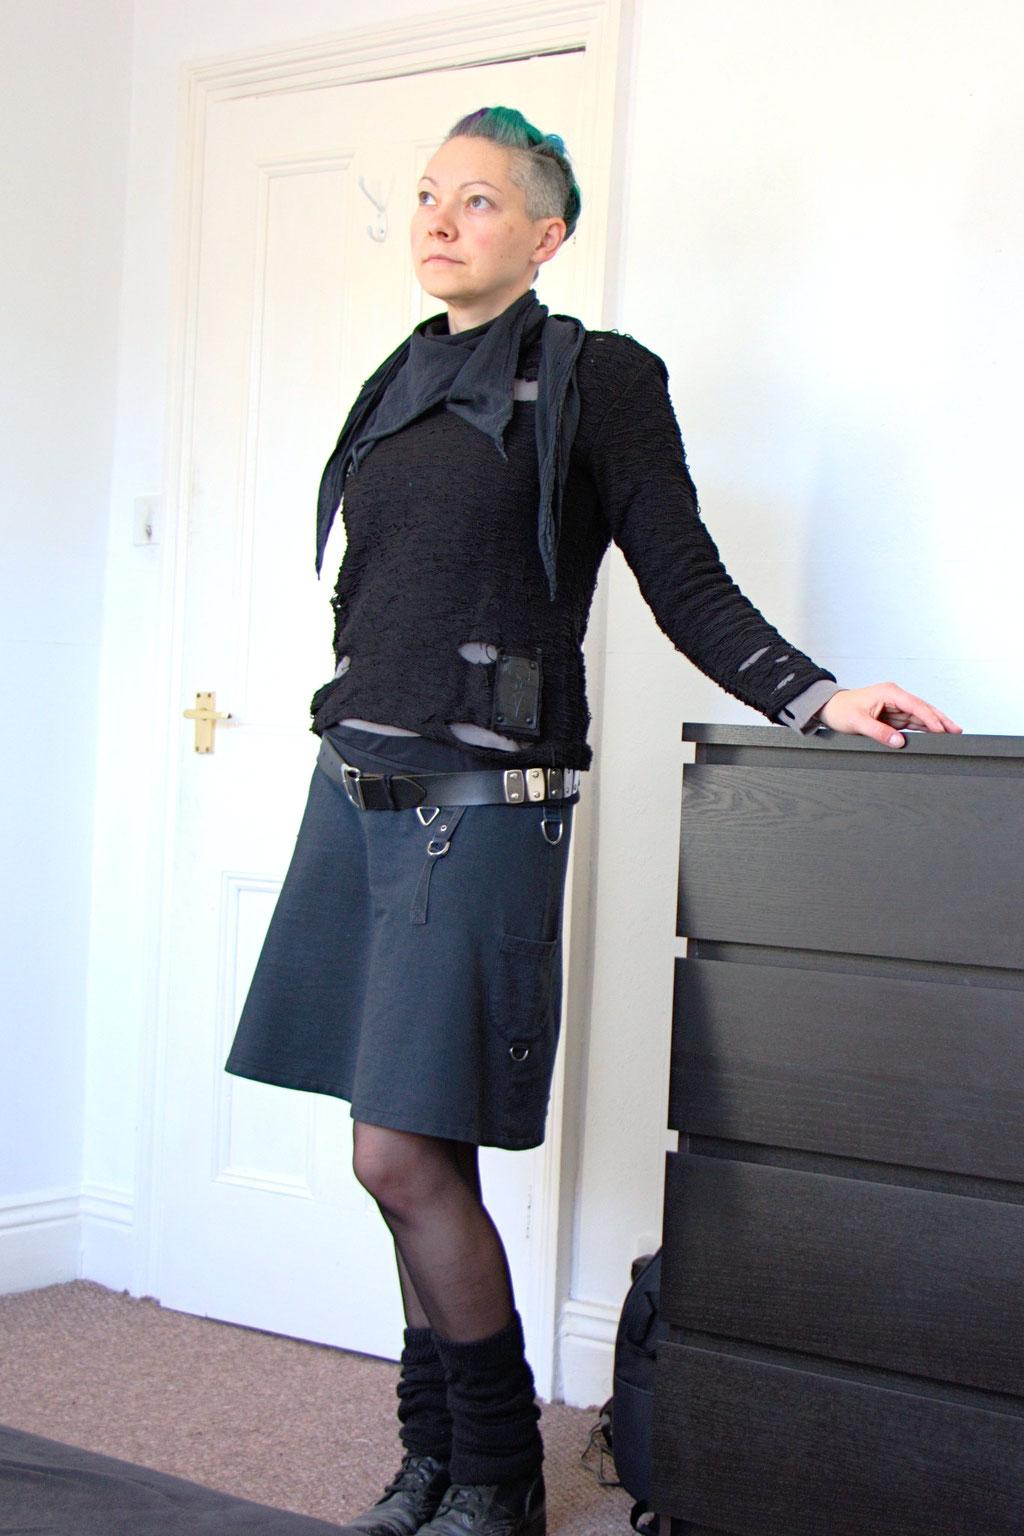 Dark post-apocalyptic outfits I wear to work - corpgoth look - Zebraspider Eco Anti-Fashion